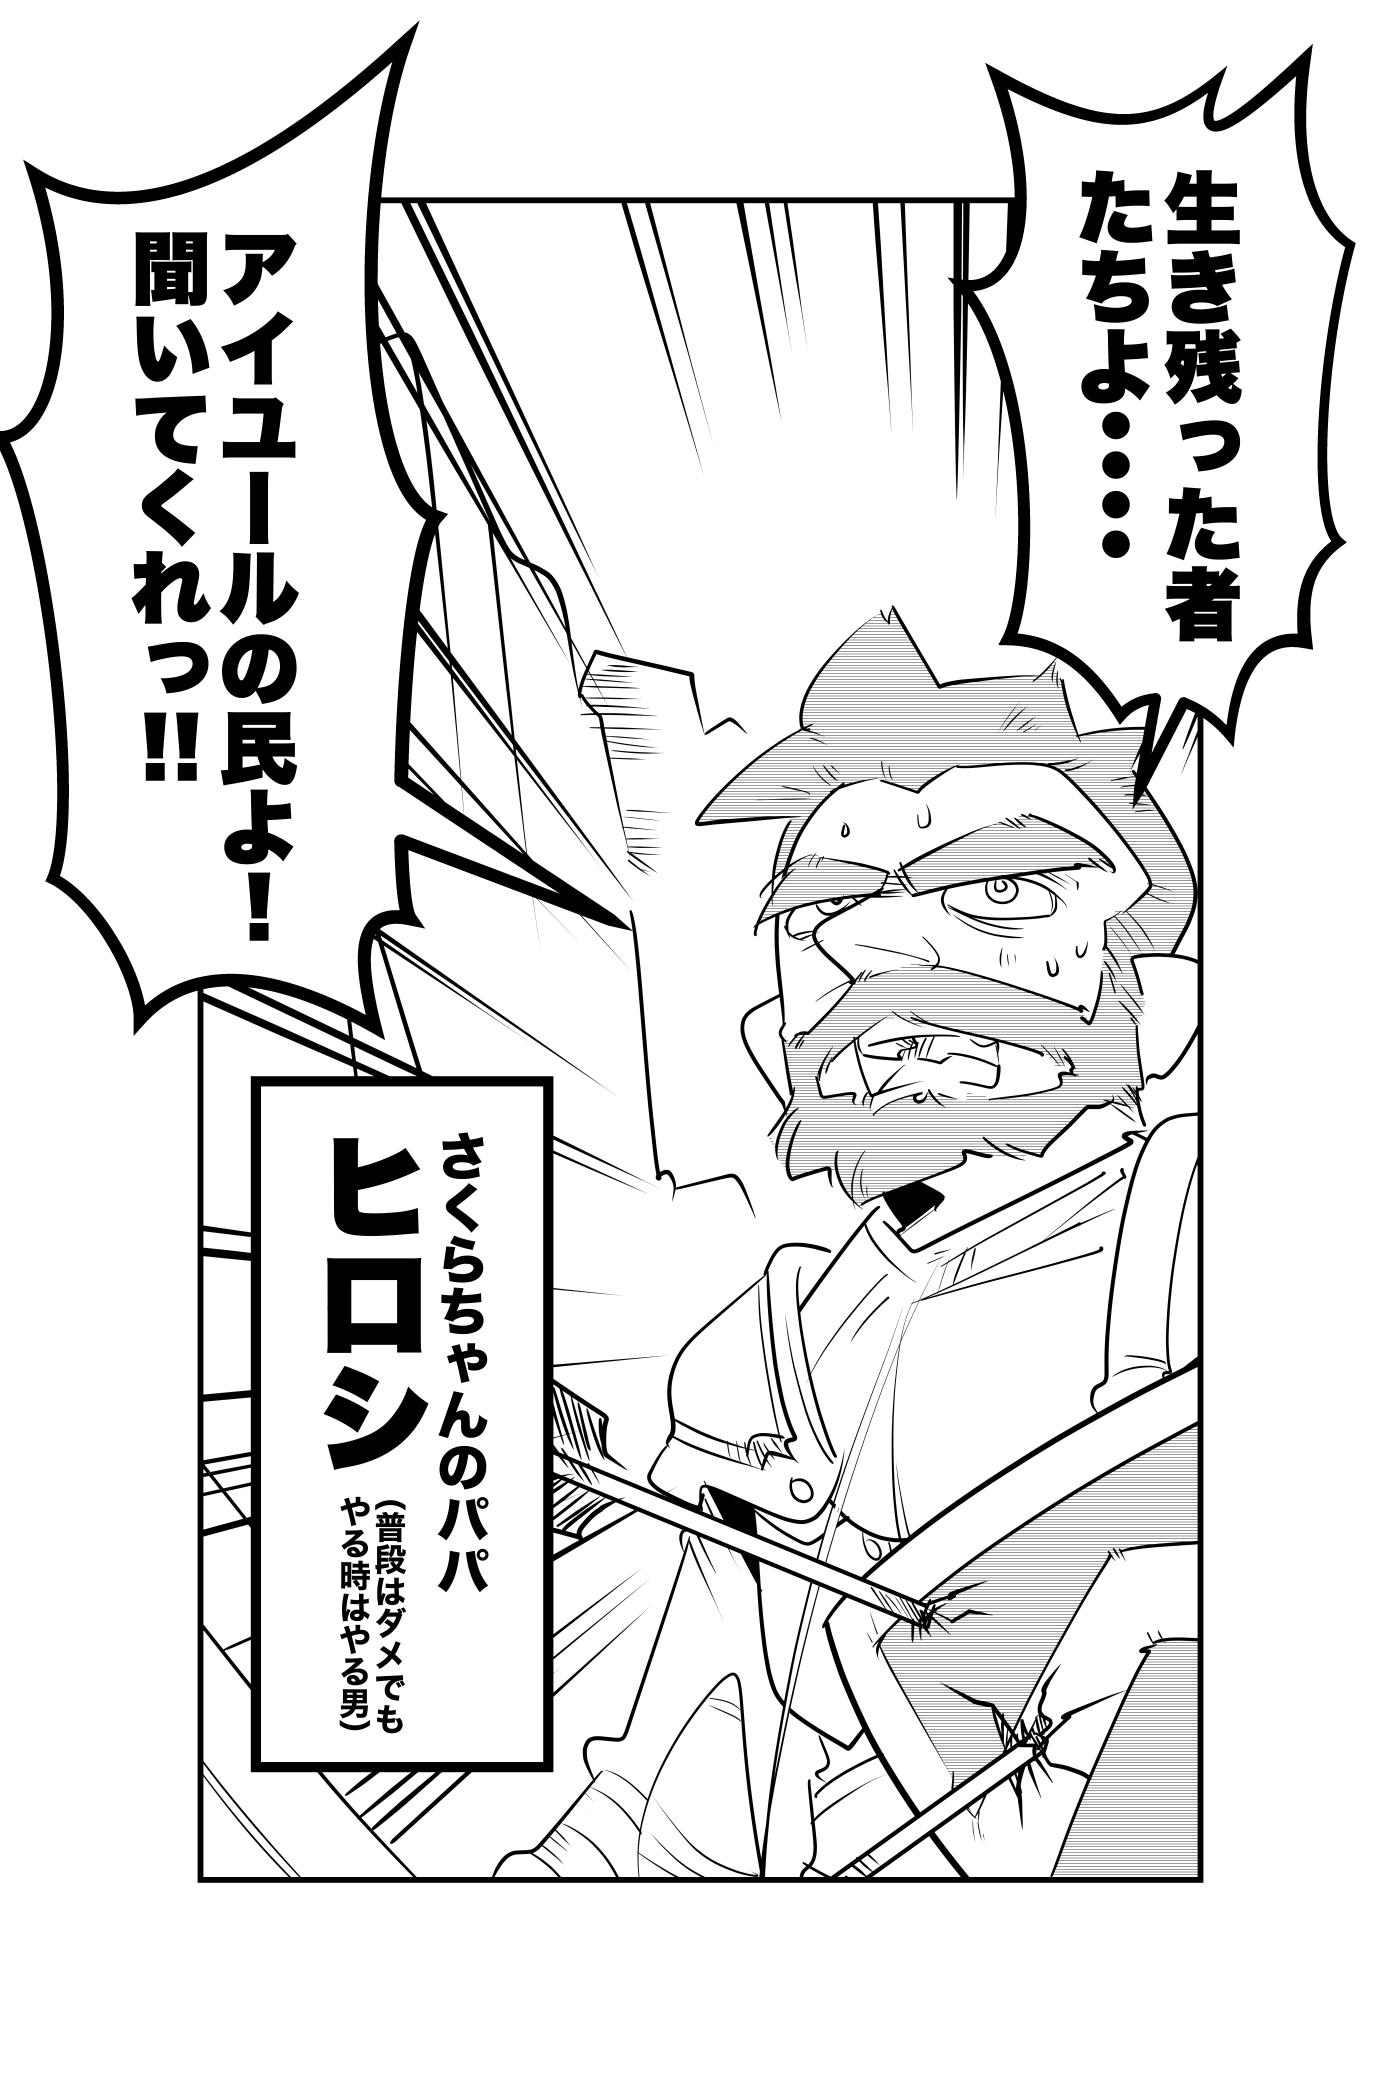 f:id:terashimaru117:20210914223535p:plain